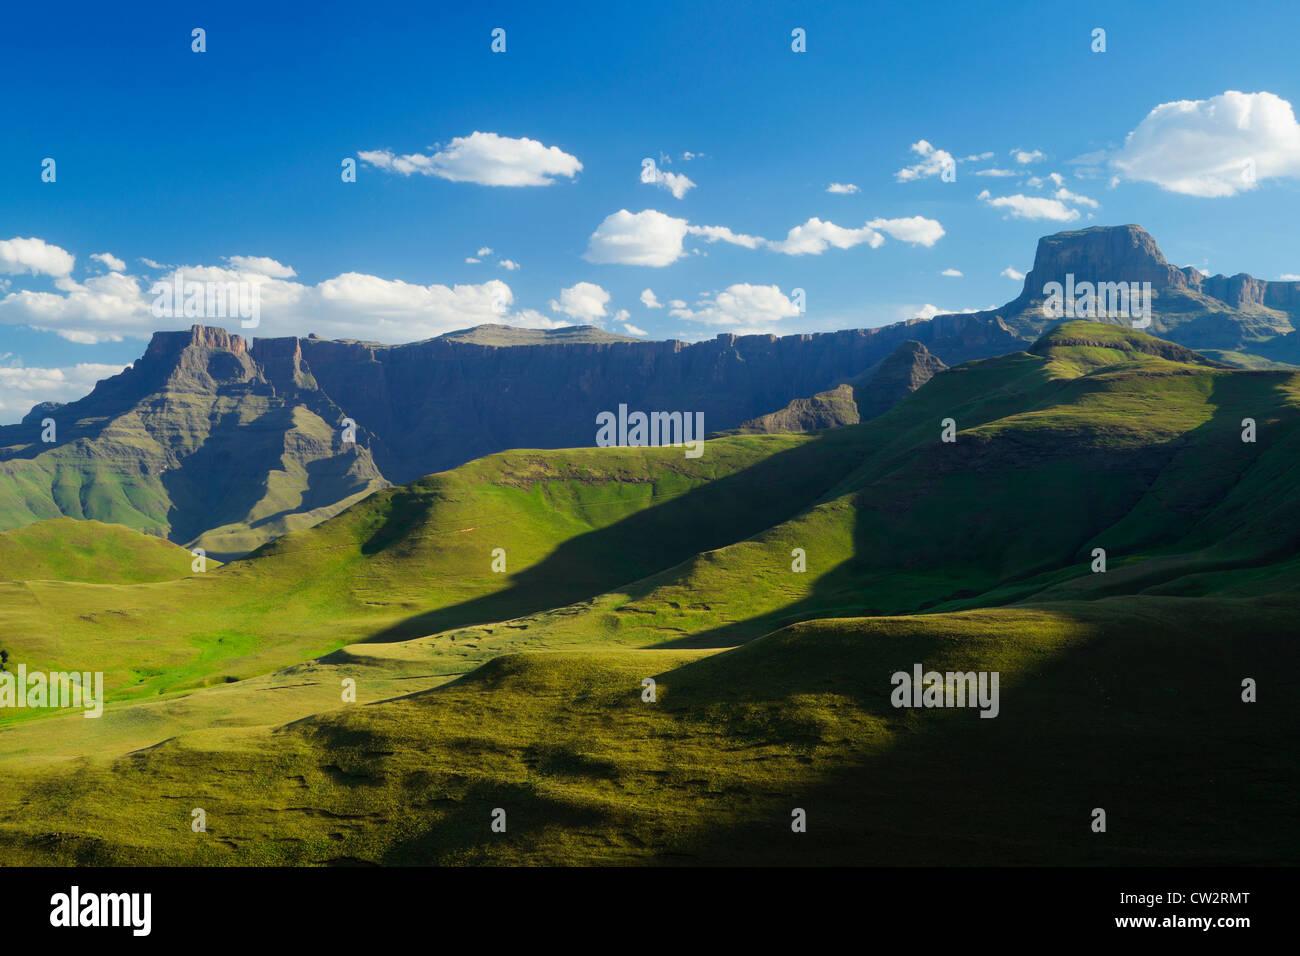 Drakensberg Amphitheater befindet sich in der Royal Natal National Park.South Africa Stockbild